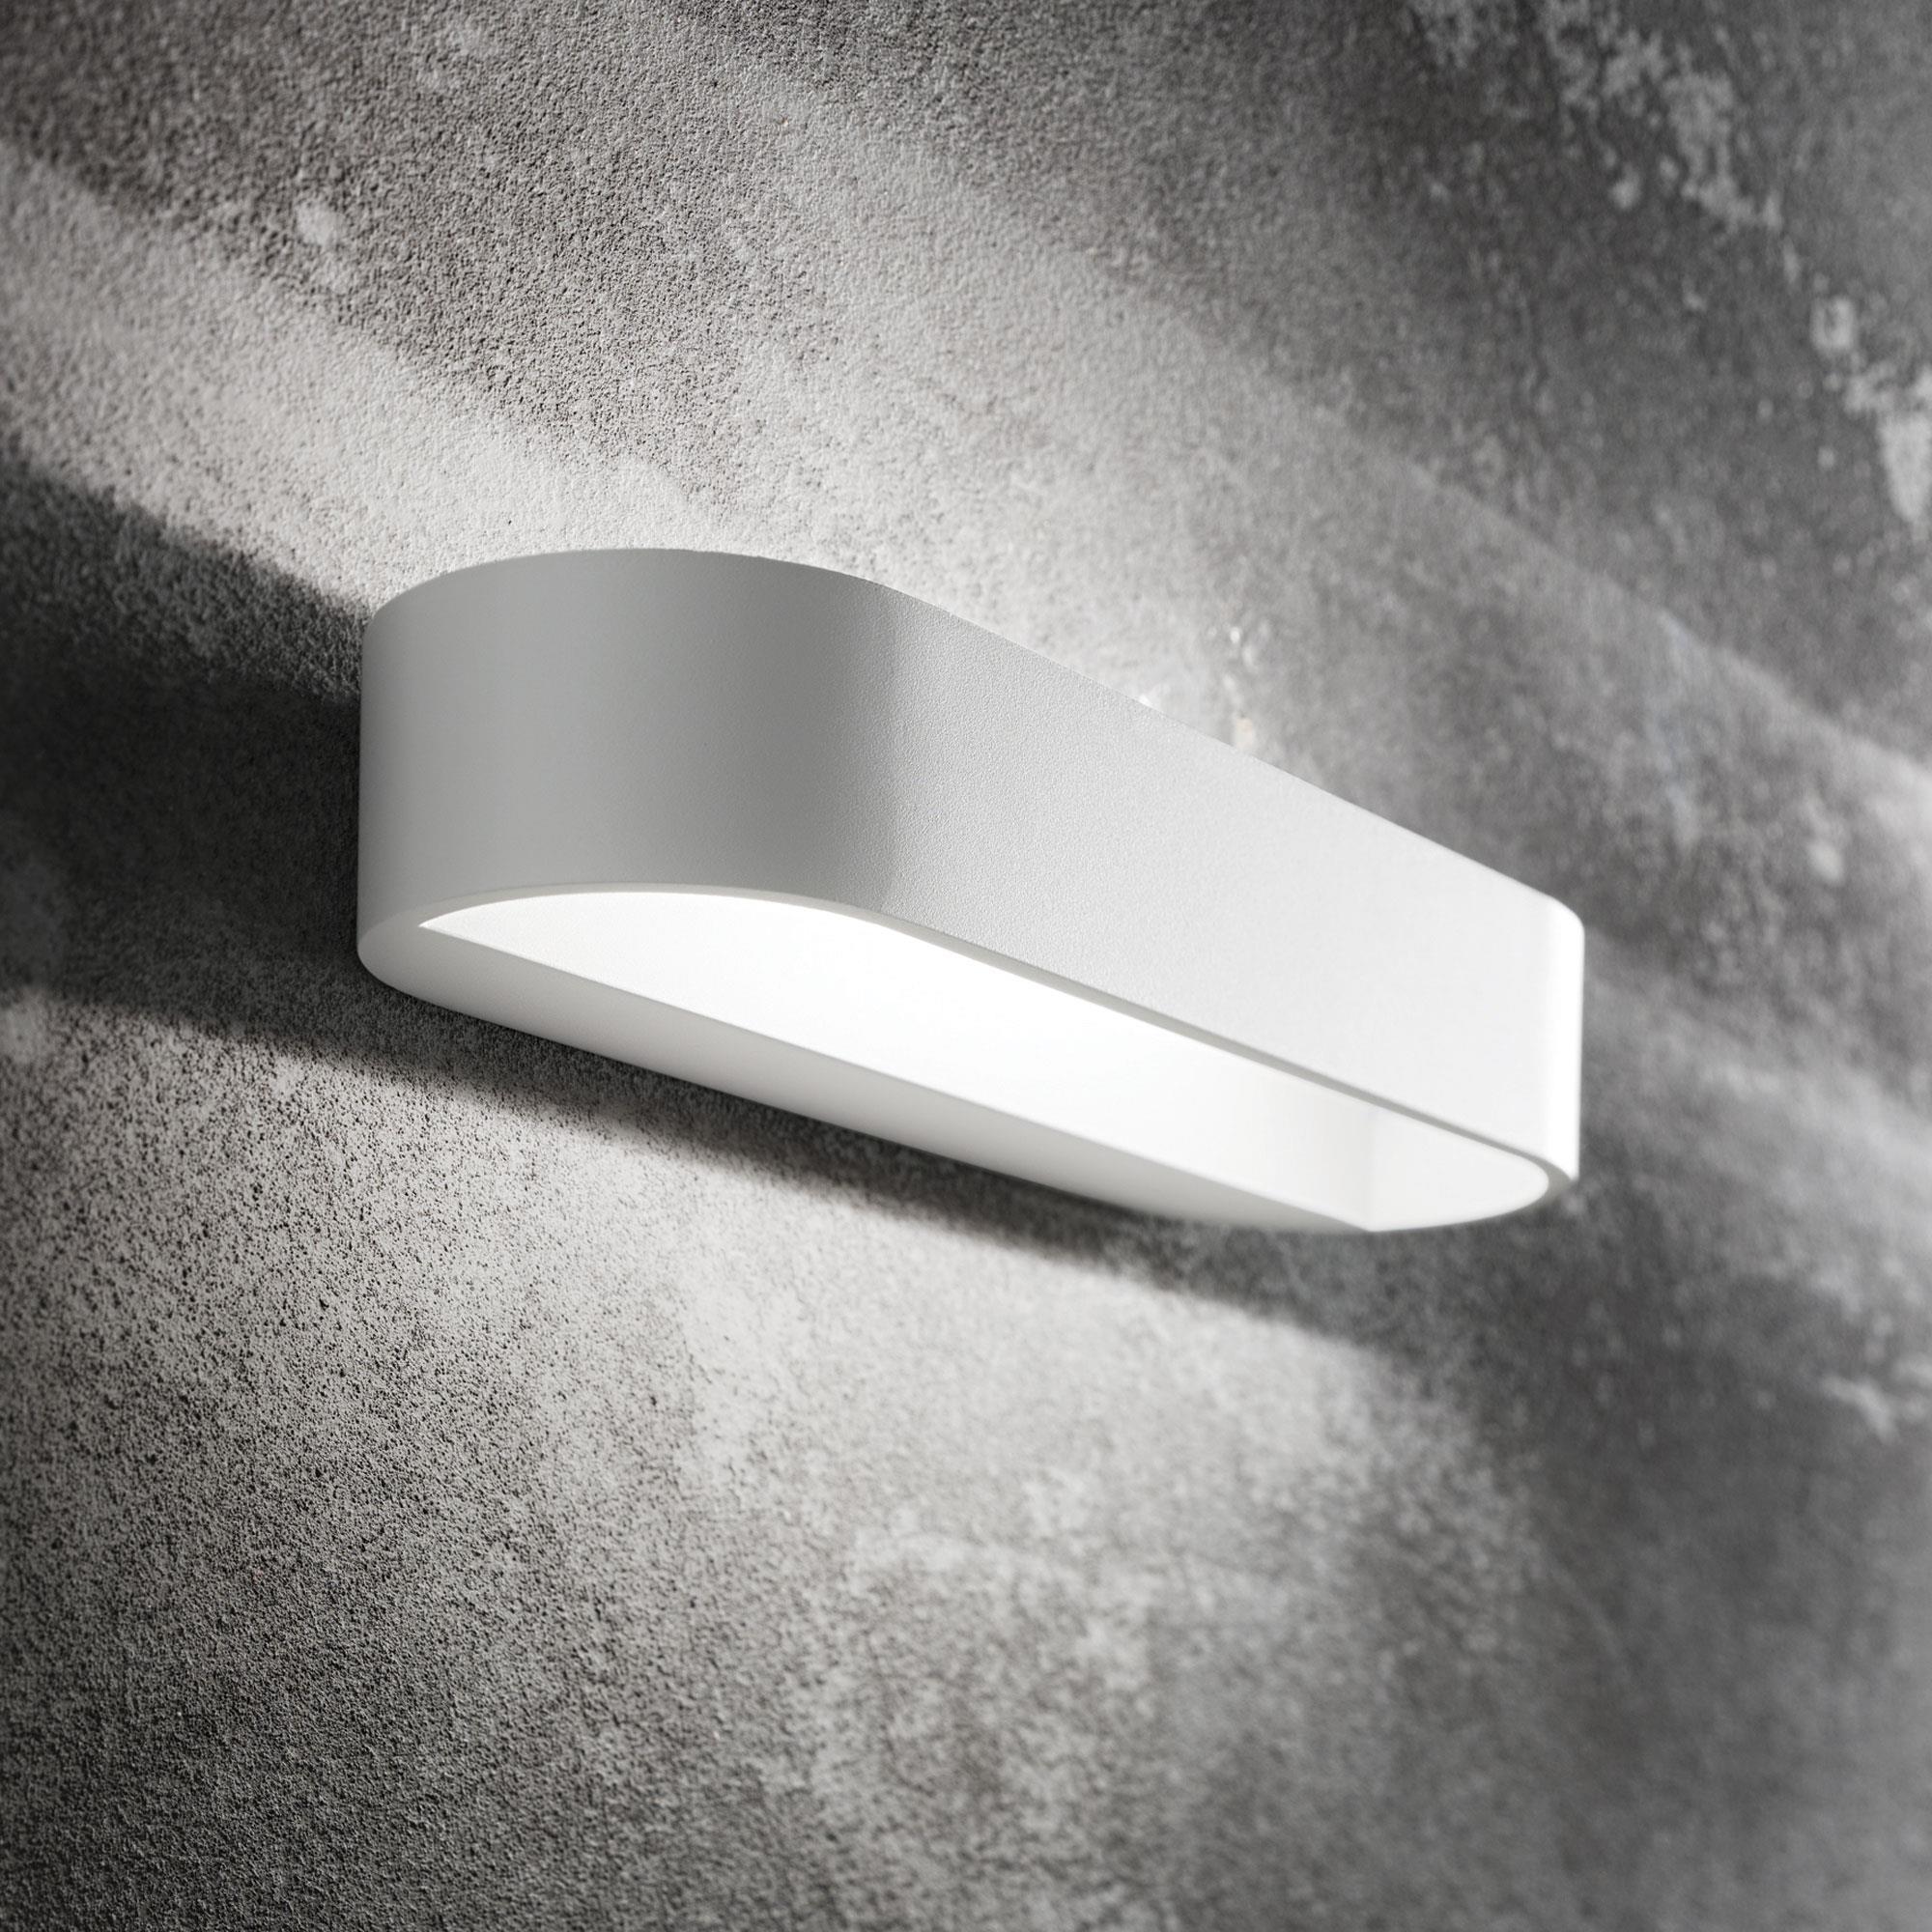 Ideal Lux 162102 LOLA AP1 BIG LED falilámpa